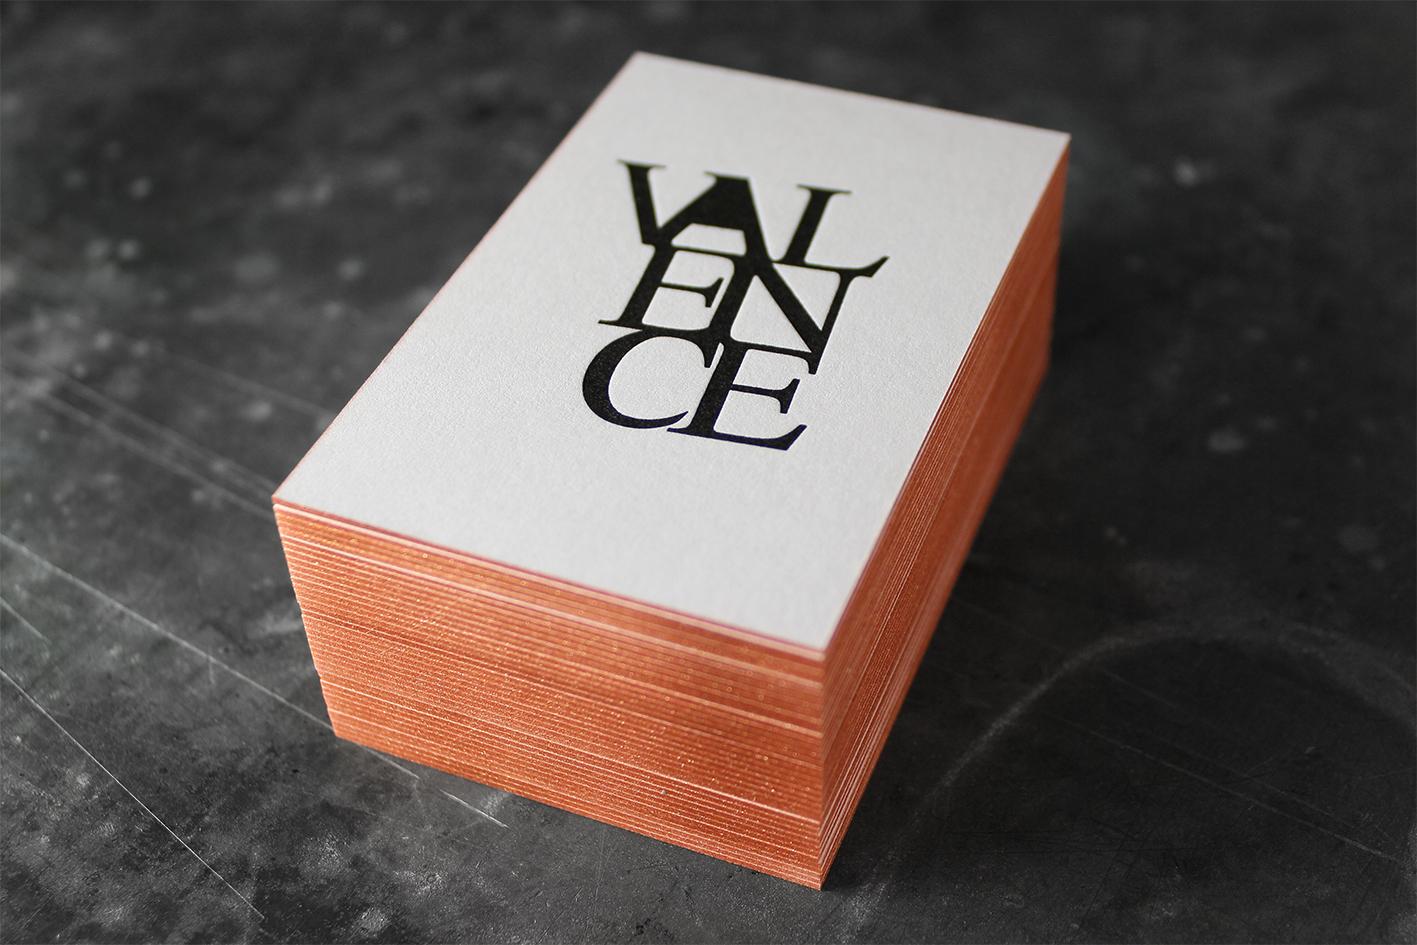 Baumwollpapier Letterpress Buchdruck Farbschnitt Goldschnitt Metallic Visitenkarten Wien Heidelberger Tiegel